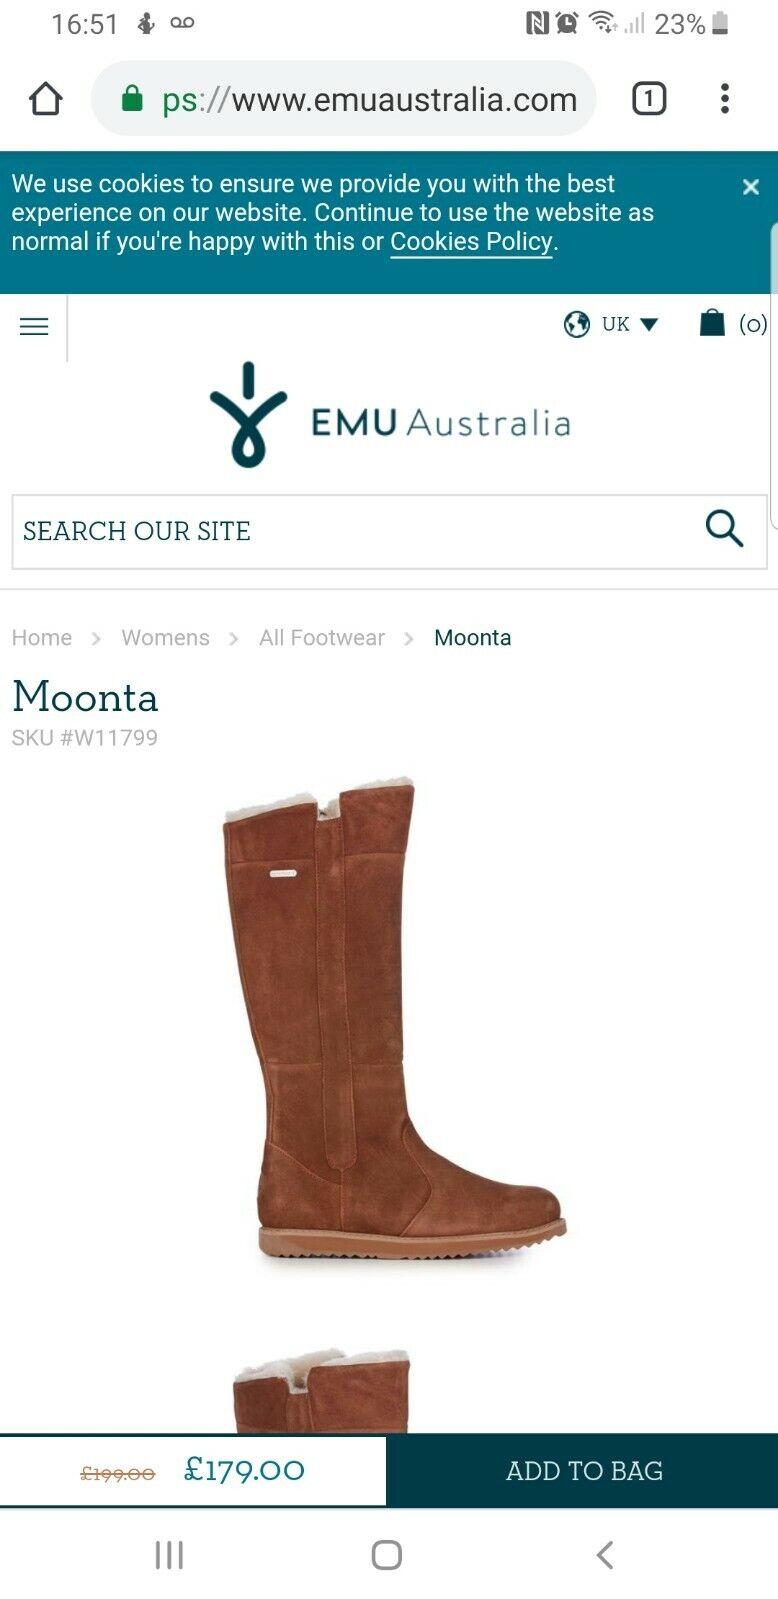 252787cb1e6 EMU Australia Moonta Womens Waterproof Sheepskin Boots SIZE 5 UK NEW  RRP179£ !!